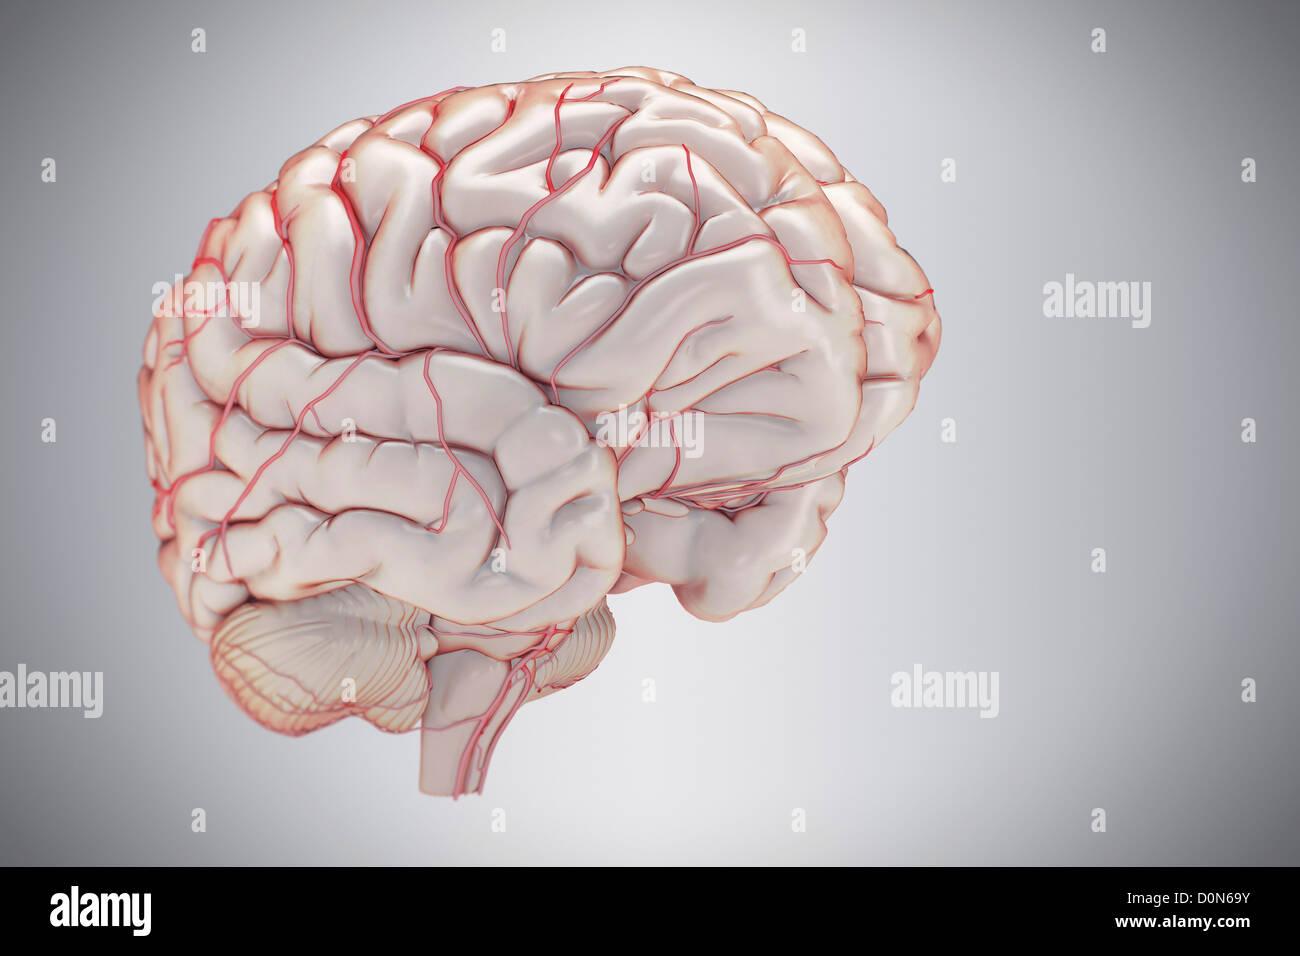 Brain Side View Imágenes De Stock & Brain Side View Fotos De Stock ...